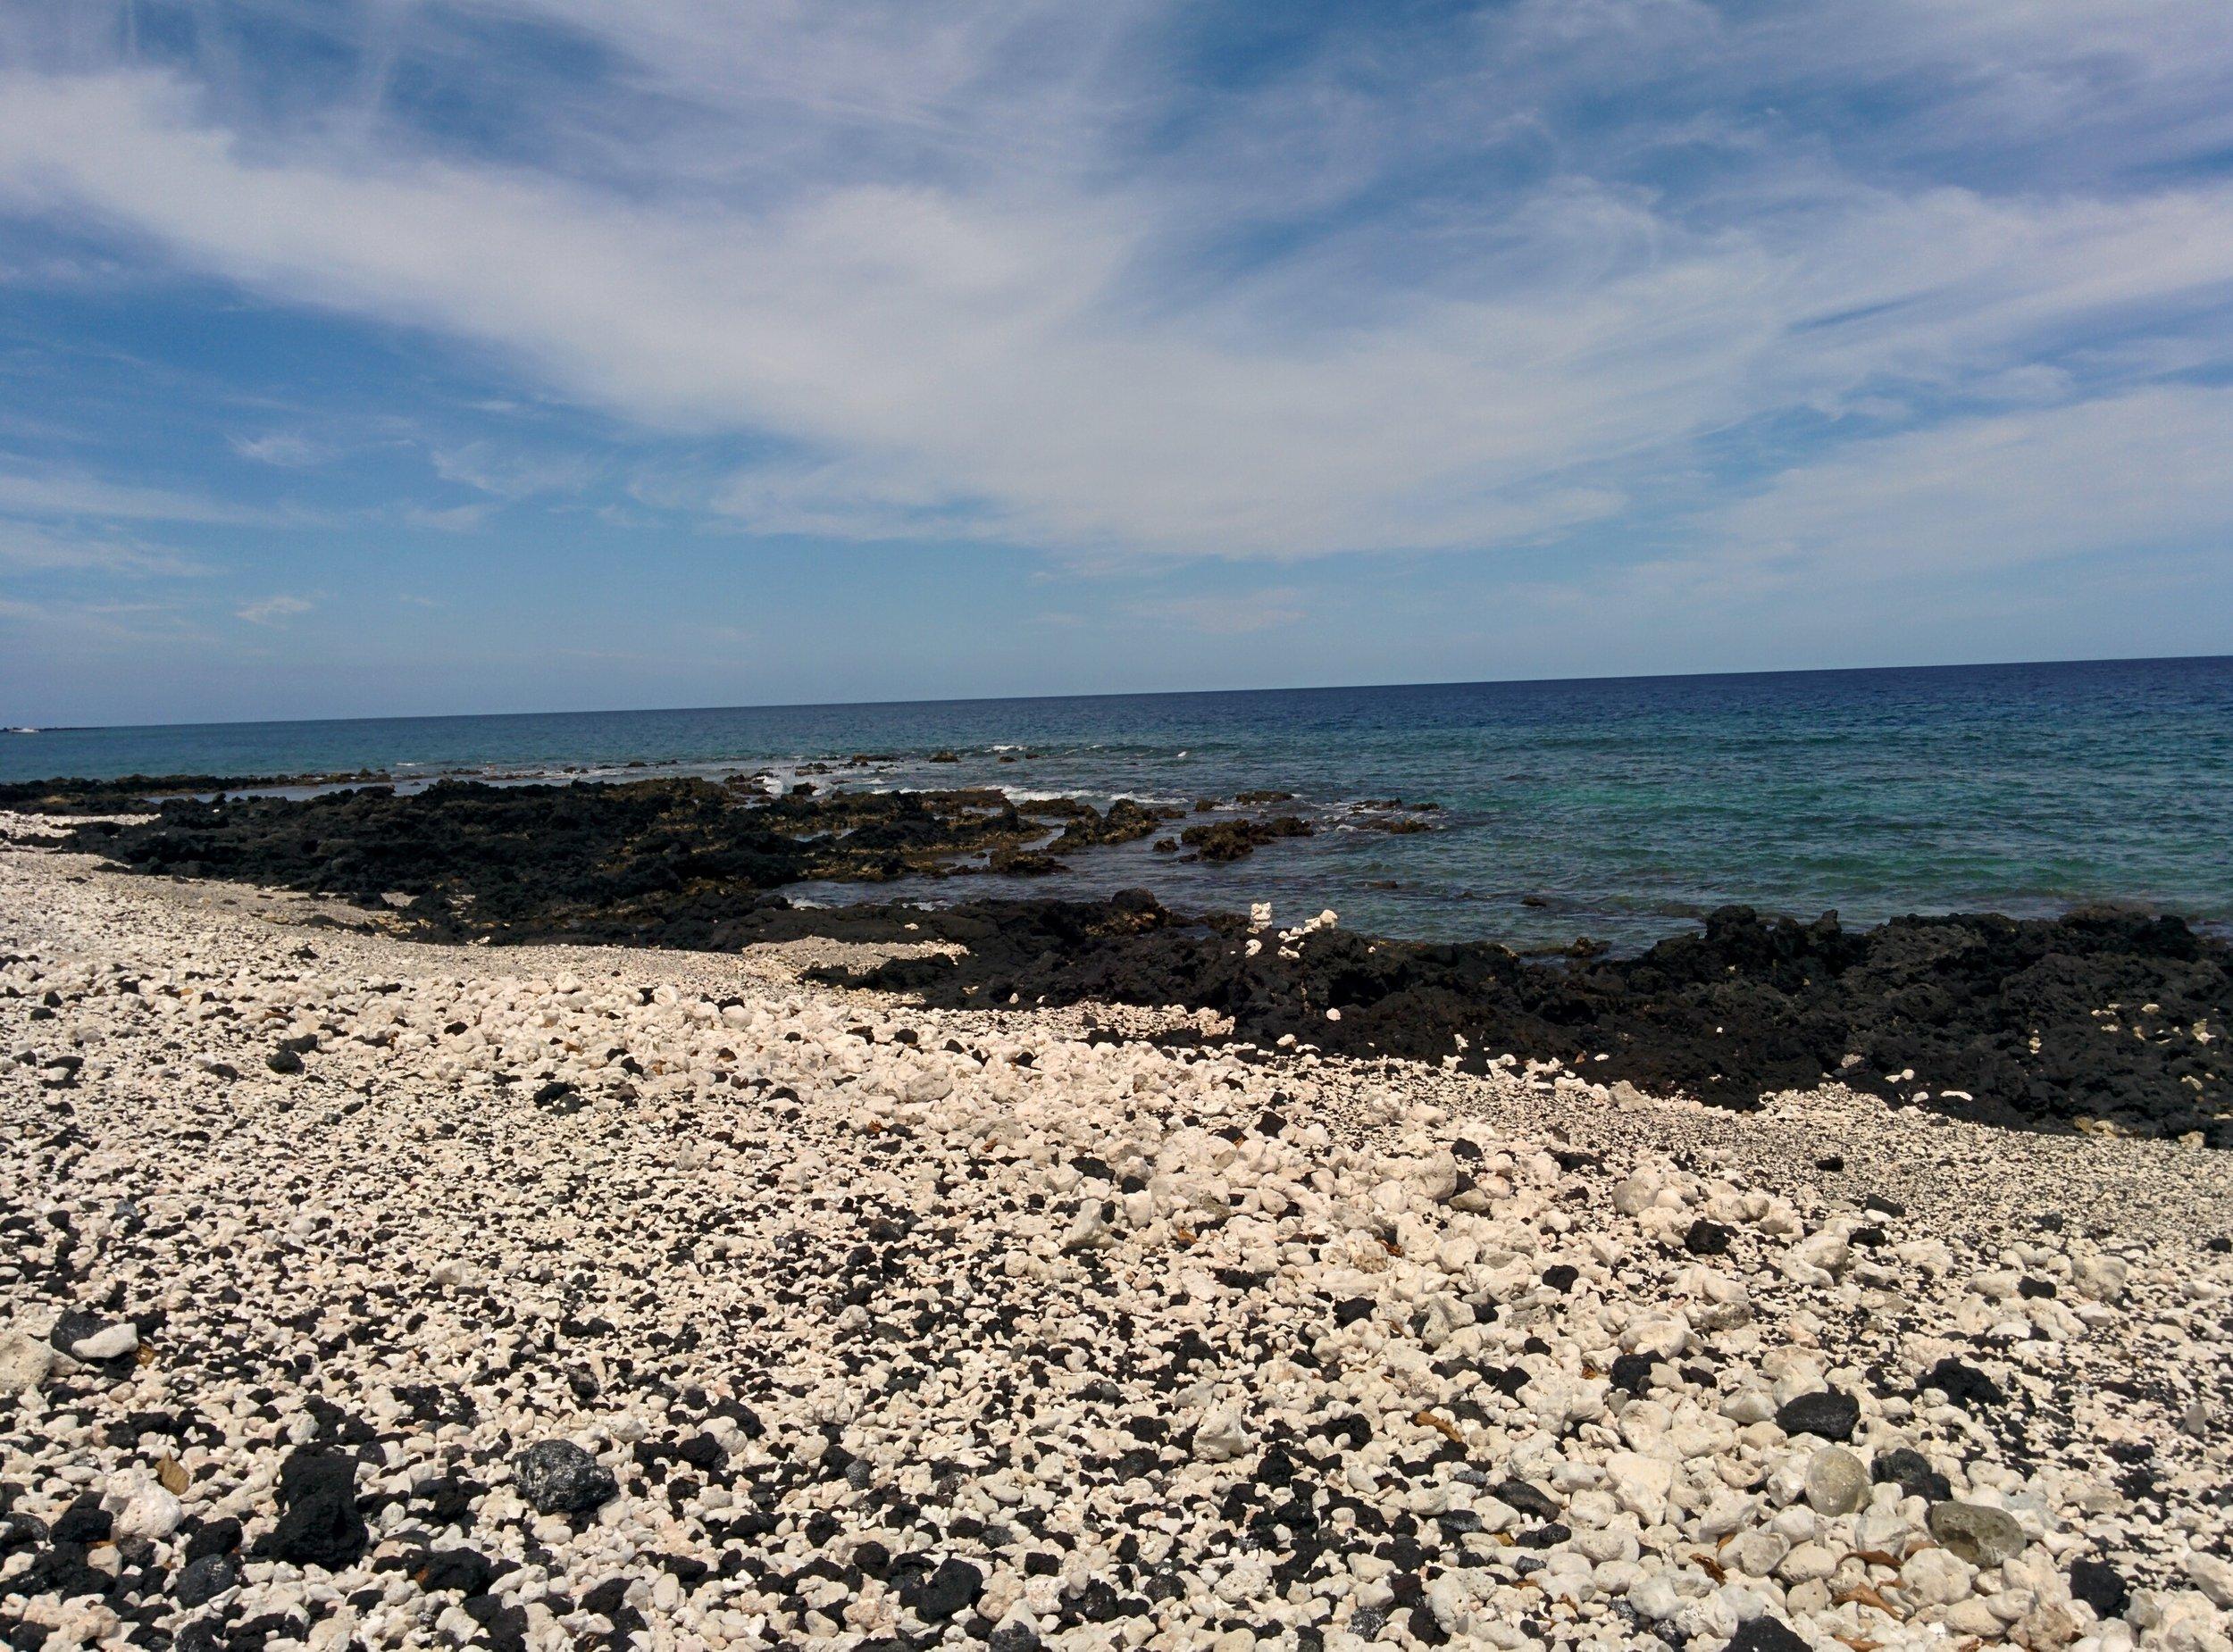 rocky-beach-big-island-2017-cindyfazzi-pic.jpg